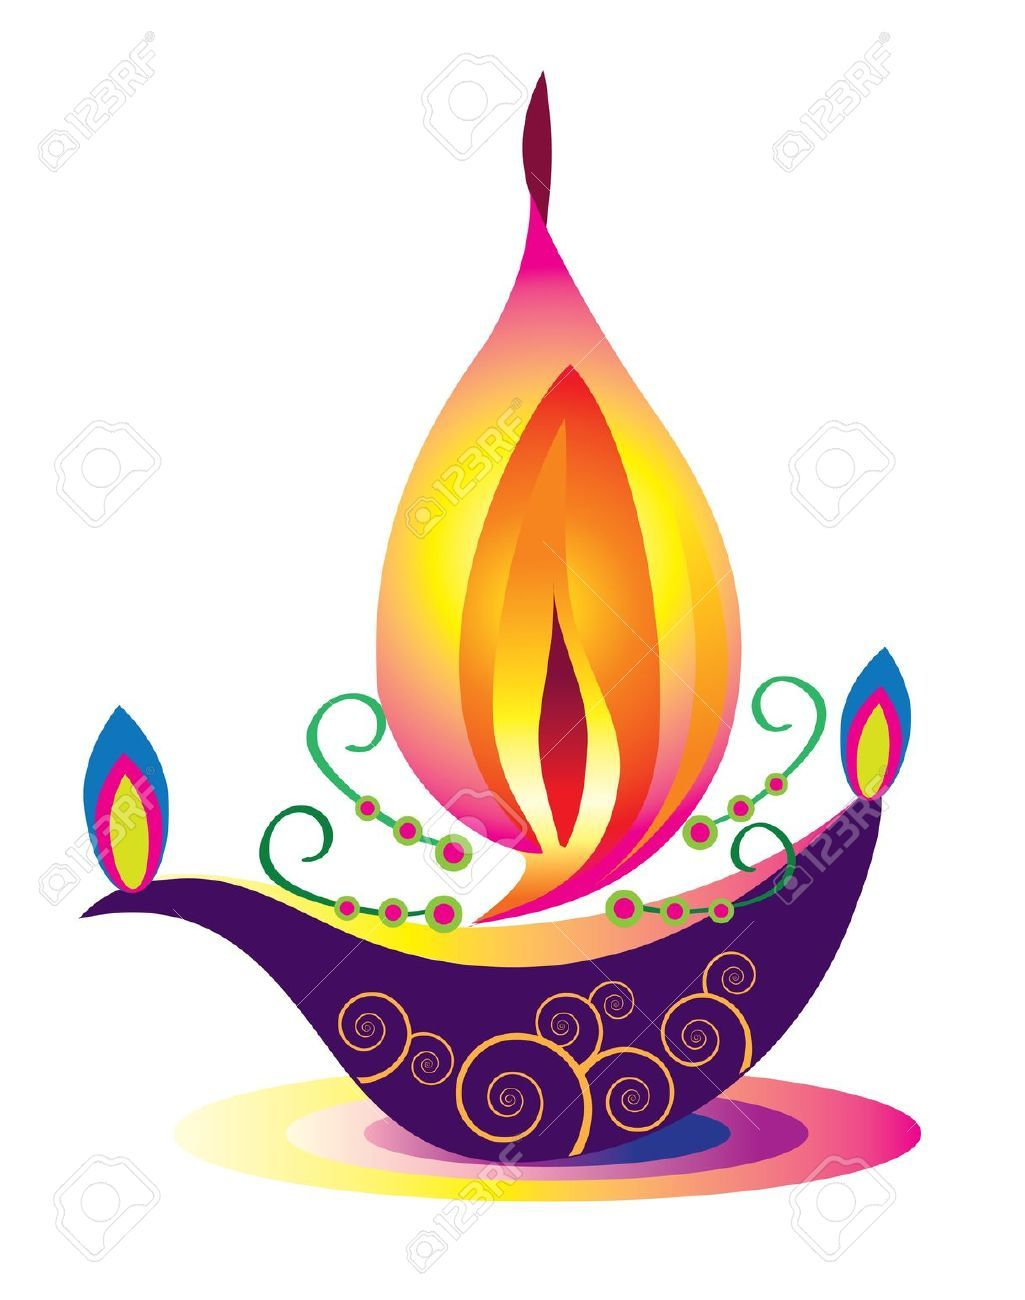 1025x1300 Oil Lamp Flame Clipart, Oil Lamp Flame Clip Art